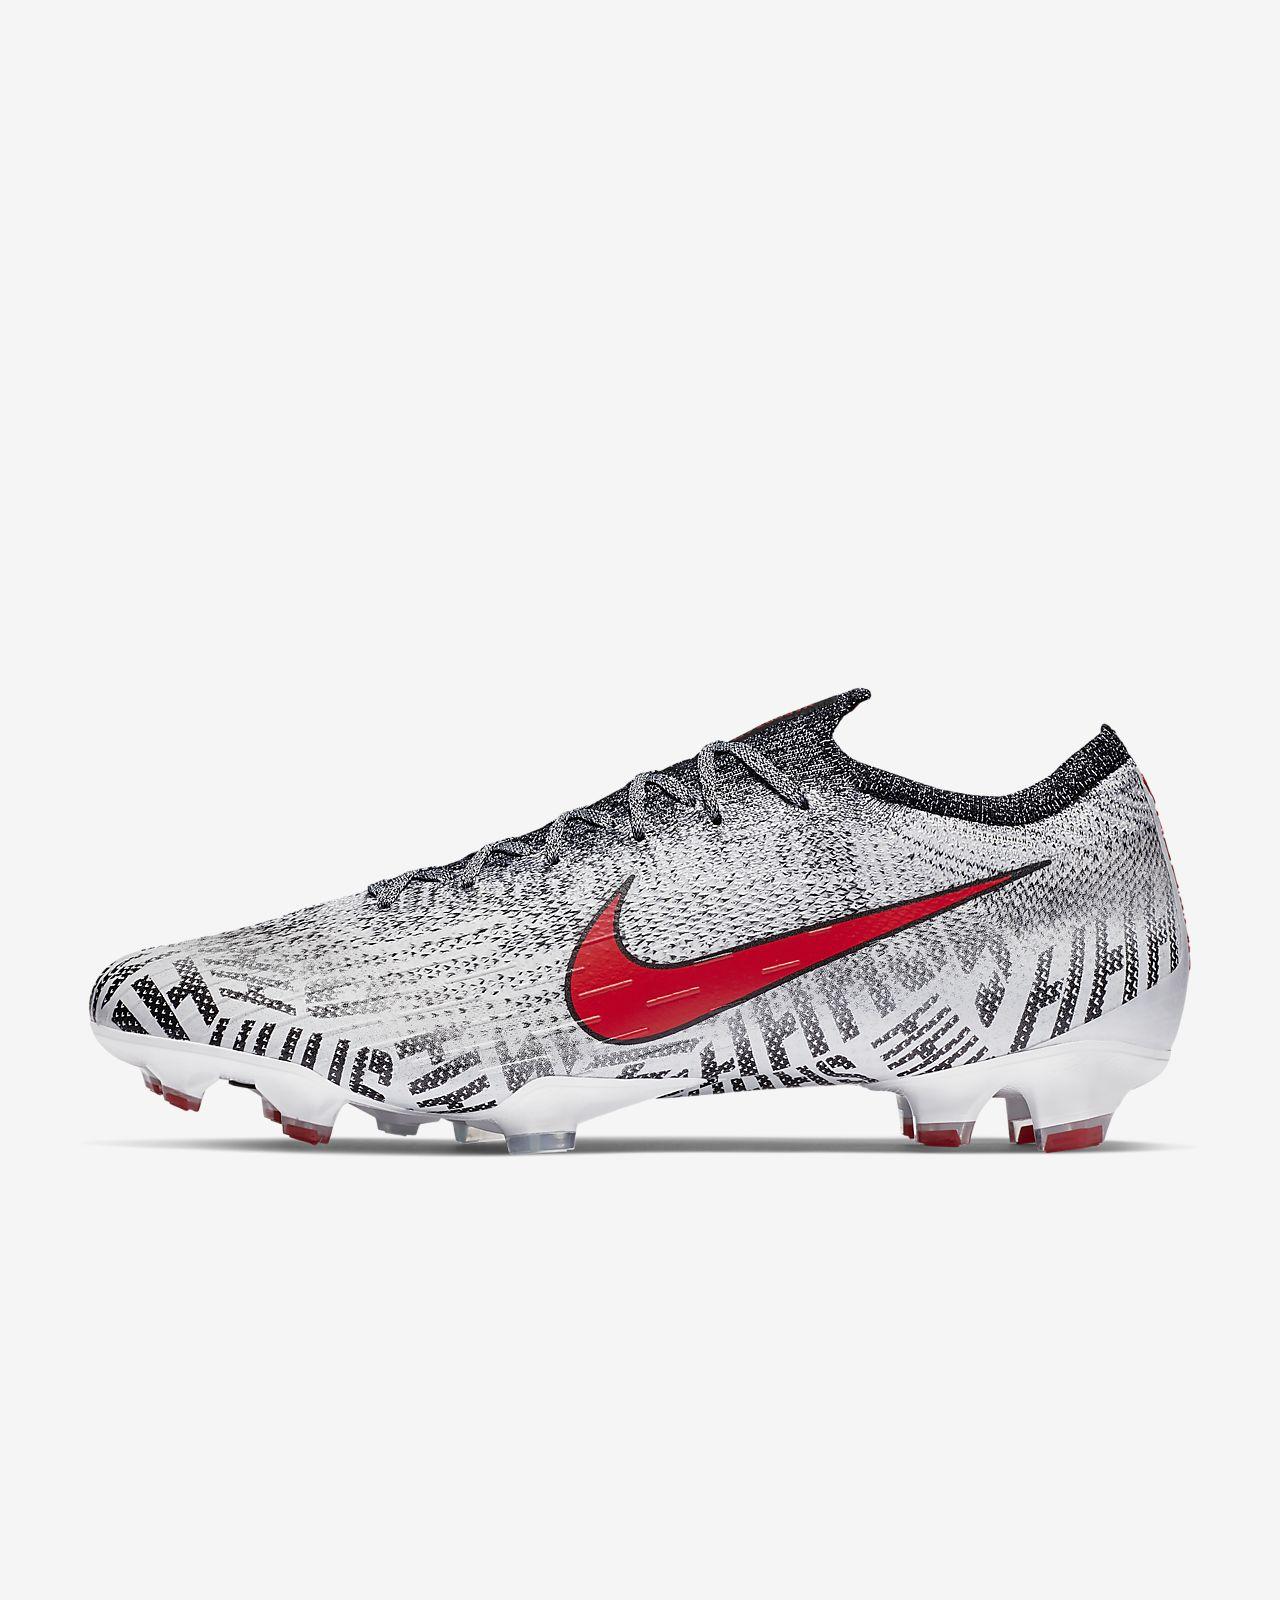 Calzado de fútbol para terreno firme Nike Mercurial Vapor 360 Elite Neymar Jr